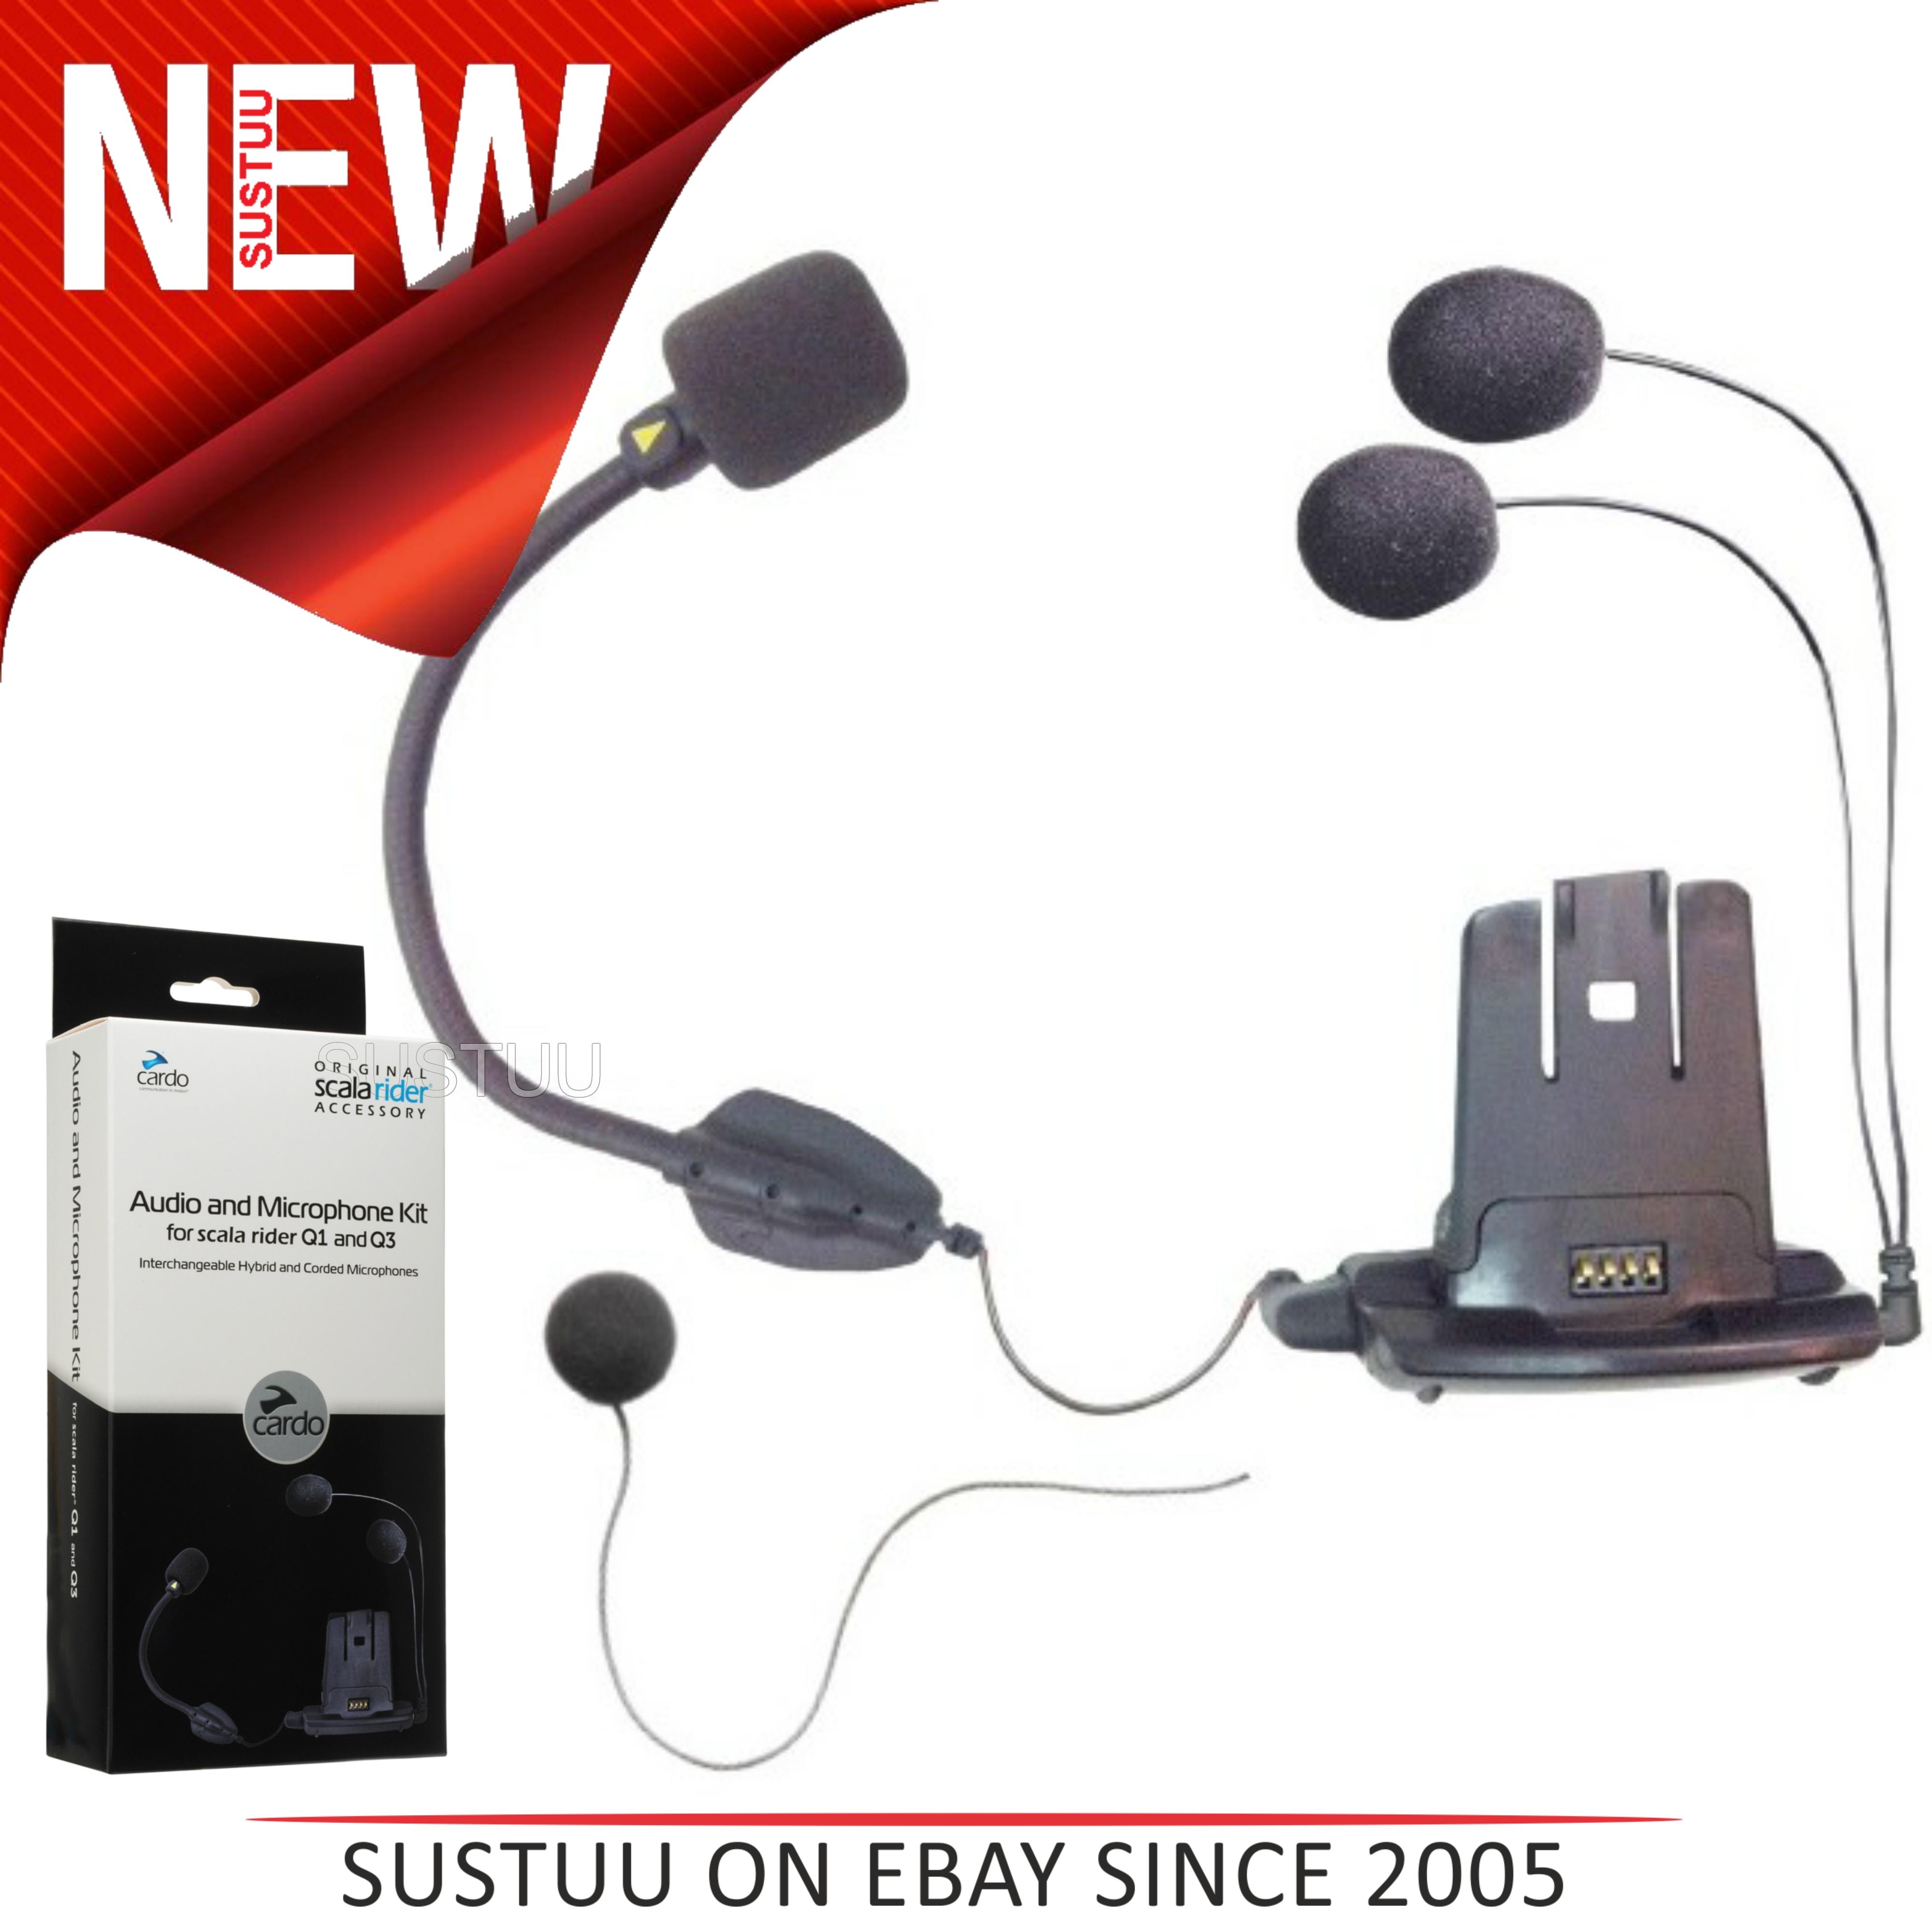 Cardo SCALA RIDER Helmet Audio & Microphone / Mic Kit with Hybrid & Corded Booms for Q1 Q3 Qz Units